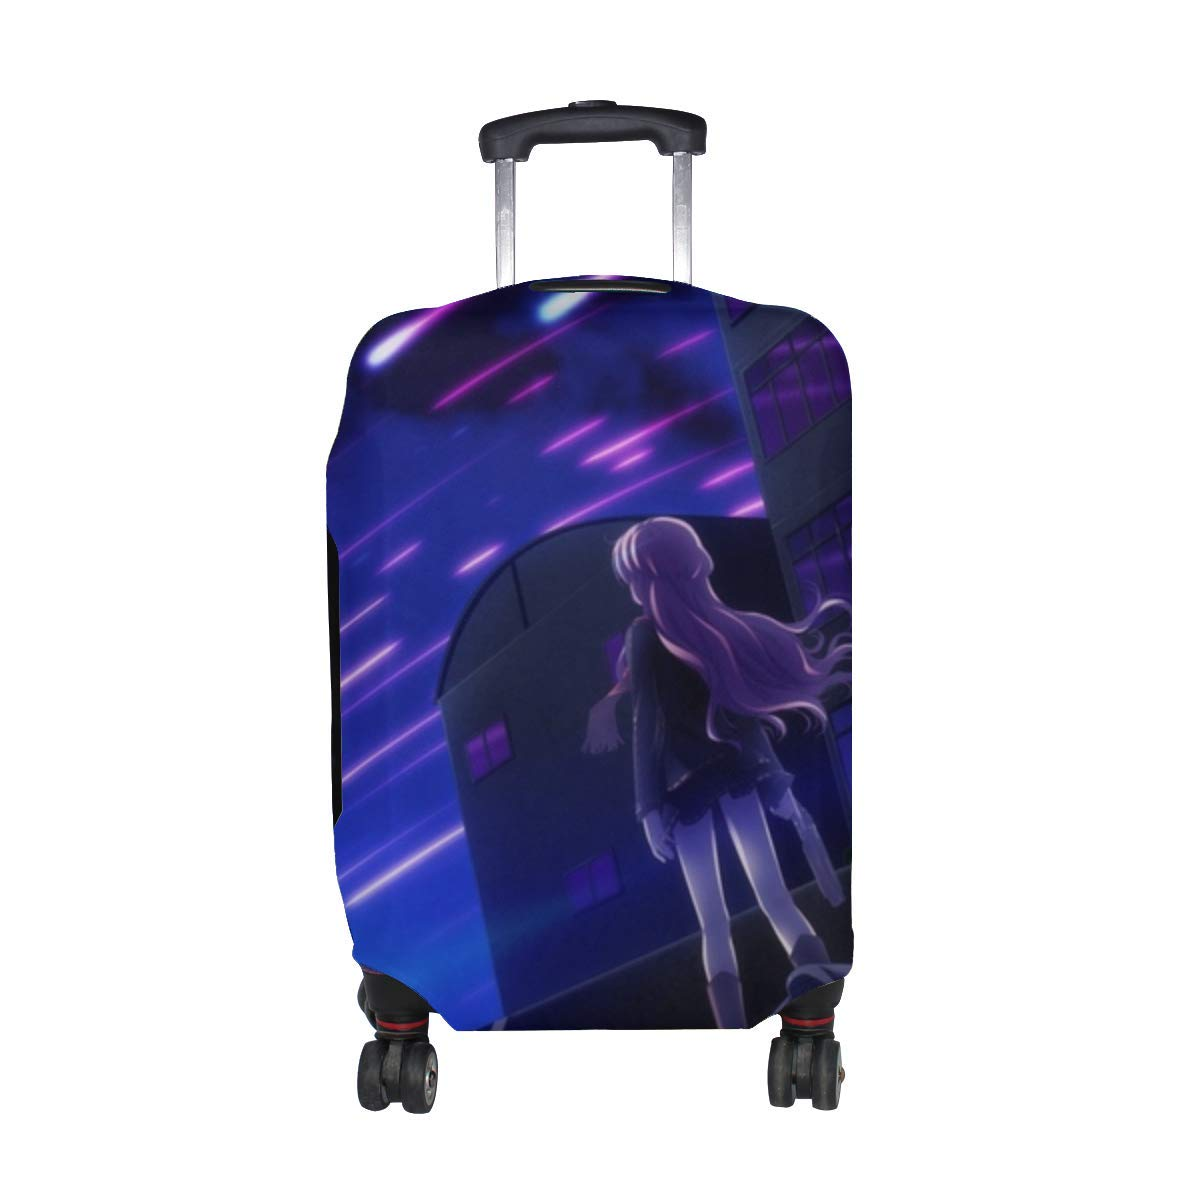 Maxm Makita Maki Anime Art Fuse Narumi Mukougaoka Kana Shinigami No Testament Takamiya Ayumu Pattern Print Travel Luggage Protector Baggage Suitcase Cover Fits 18-21 Inch Luggage